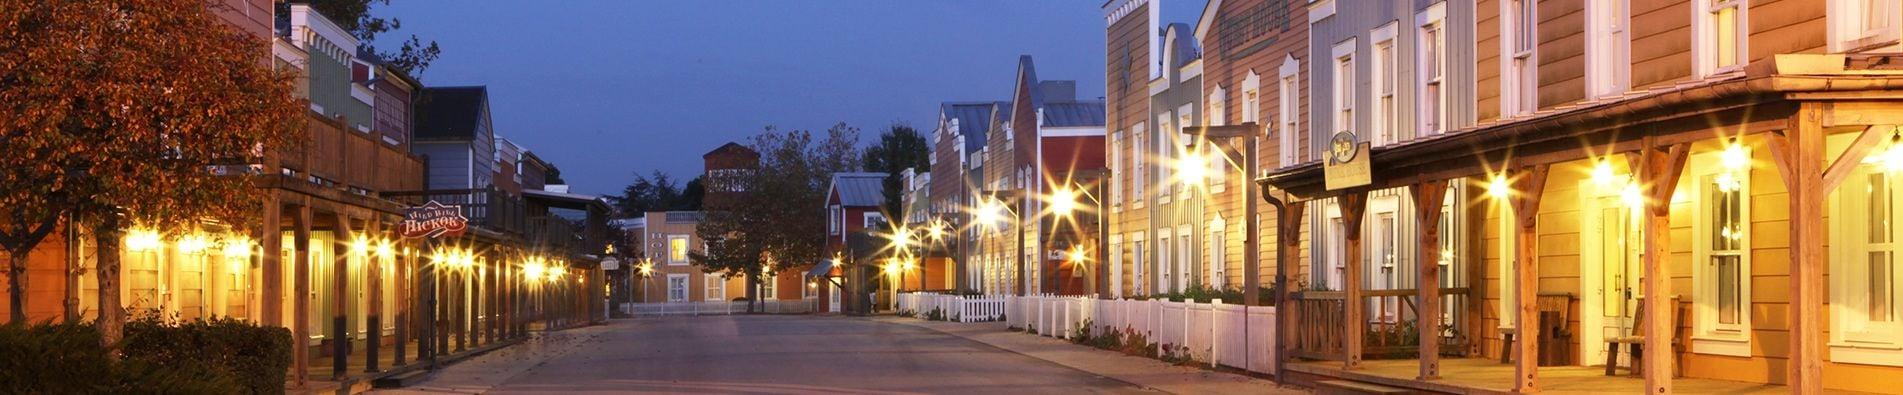 Disney's Hôtel Cheyenne